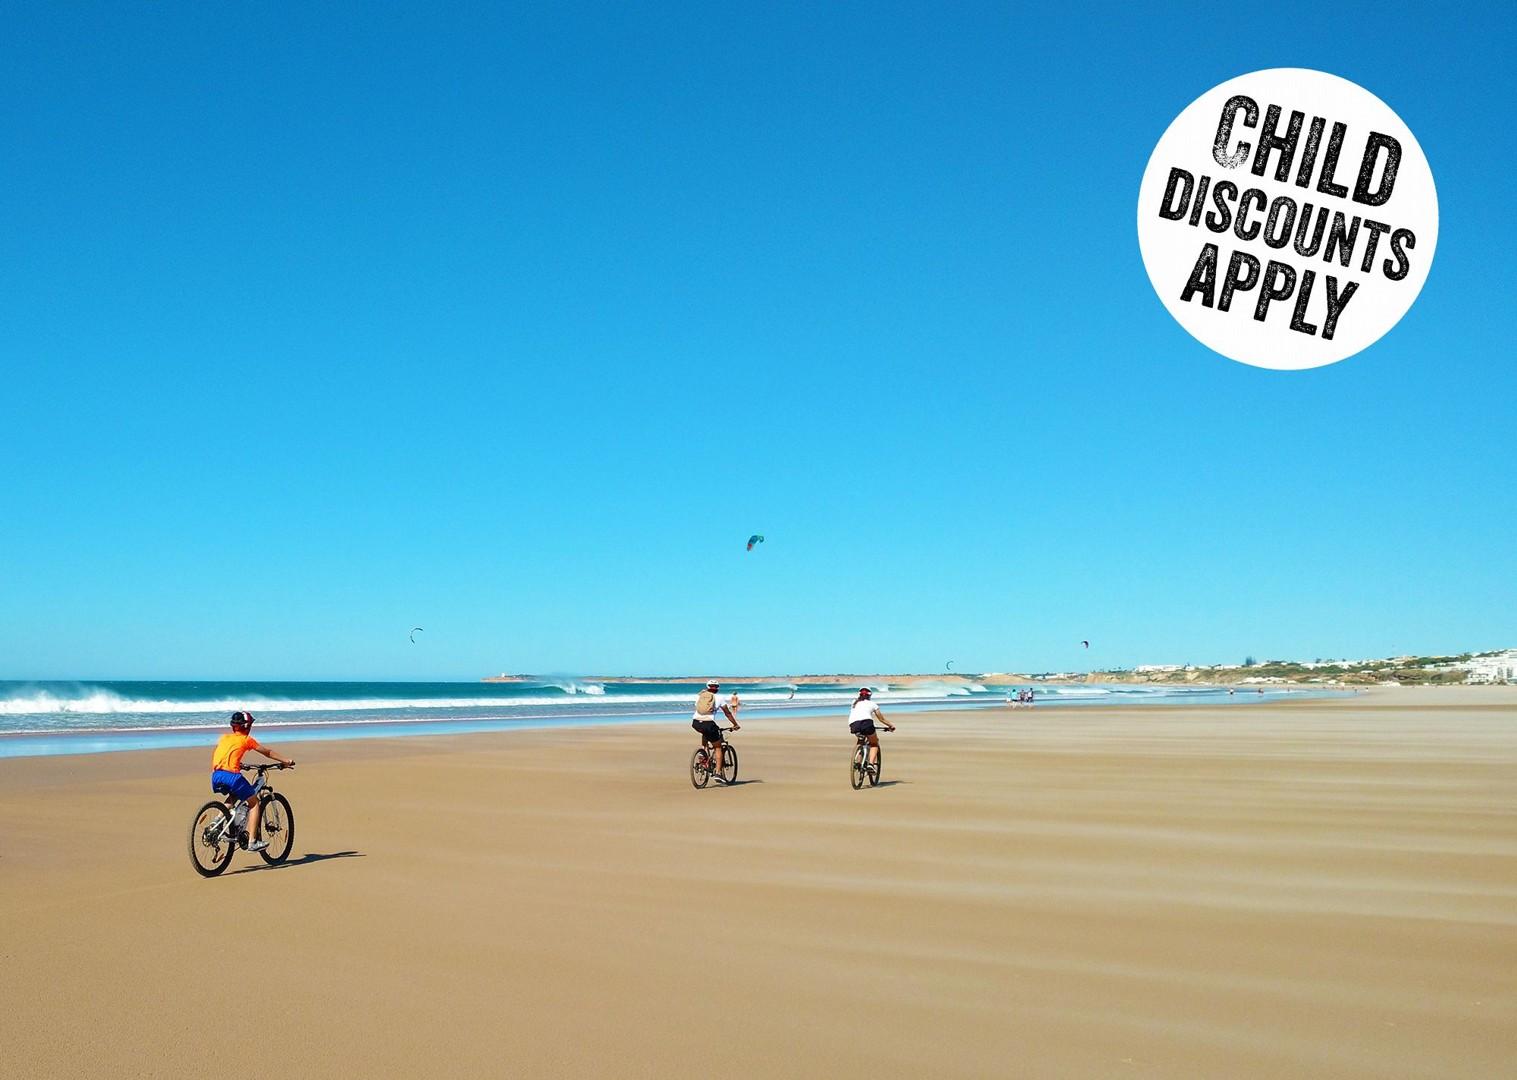 spain-family-adventurer-cycling-beach-holiday.jpg - Southern Spain - Coastal Adventurer - Self-Guided Family Cycling Holiday - Family Cycling